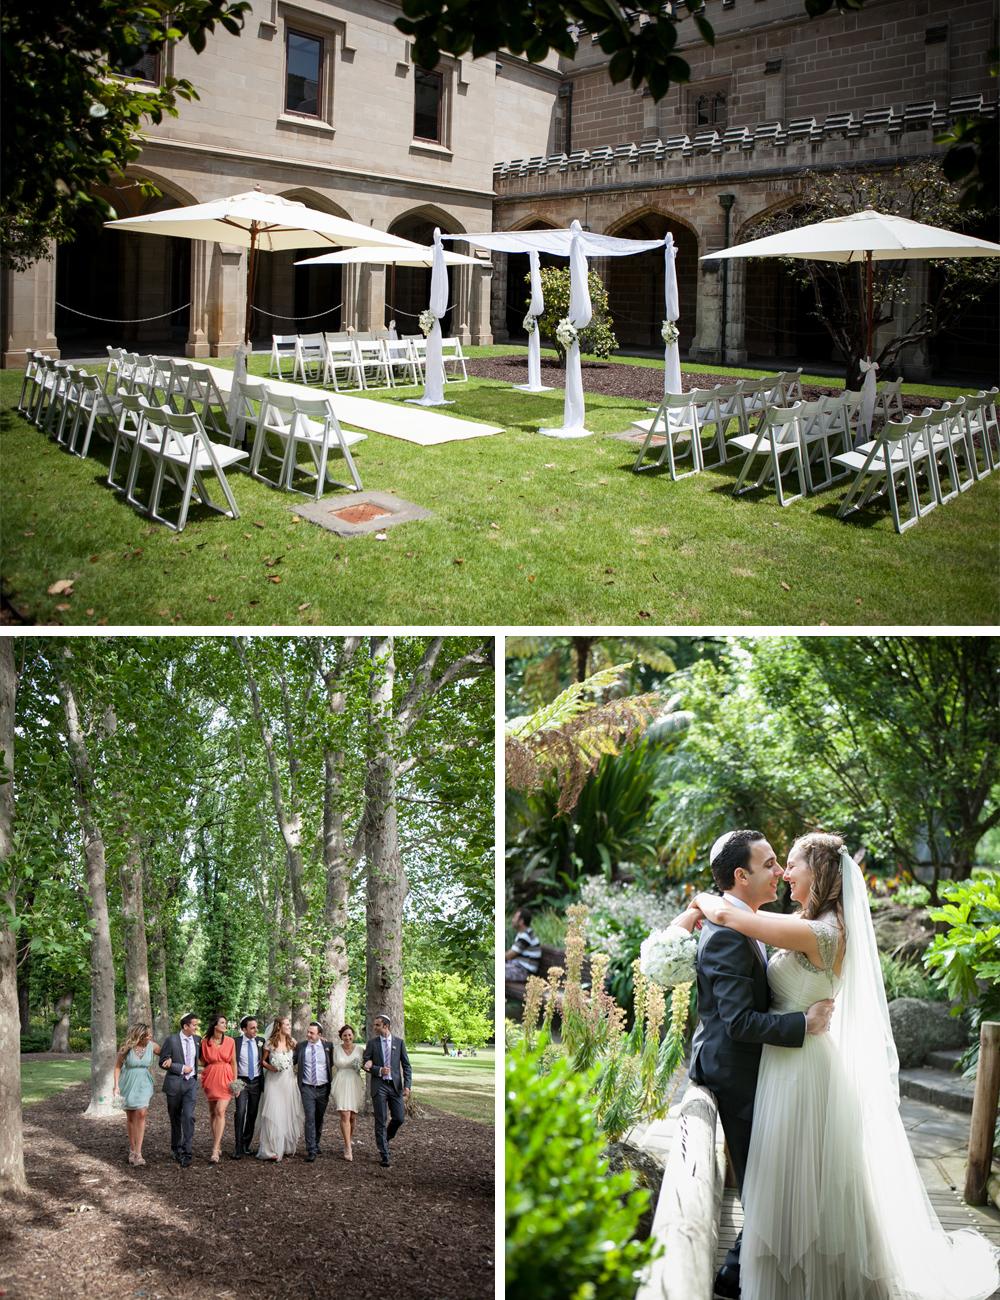 Jewish wedding Melbourne University and Luminare C